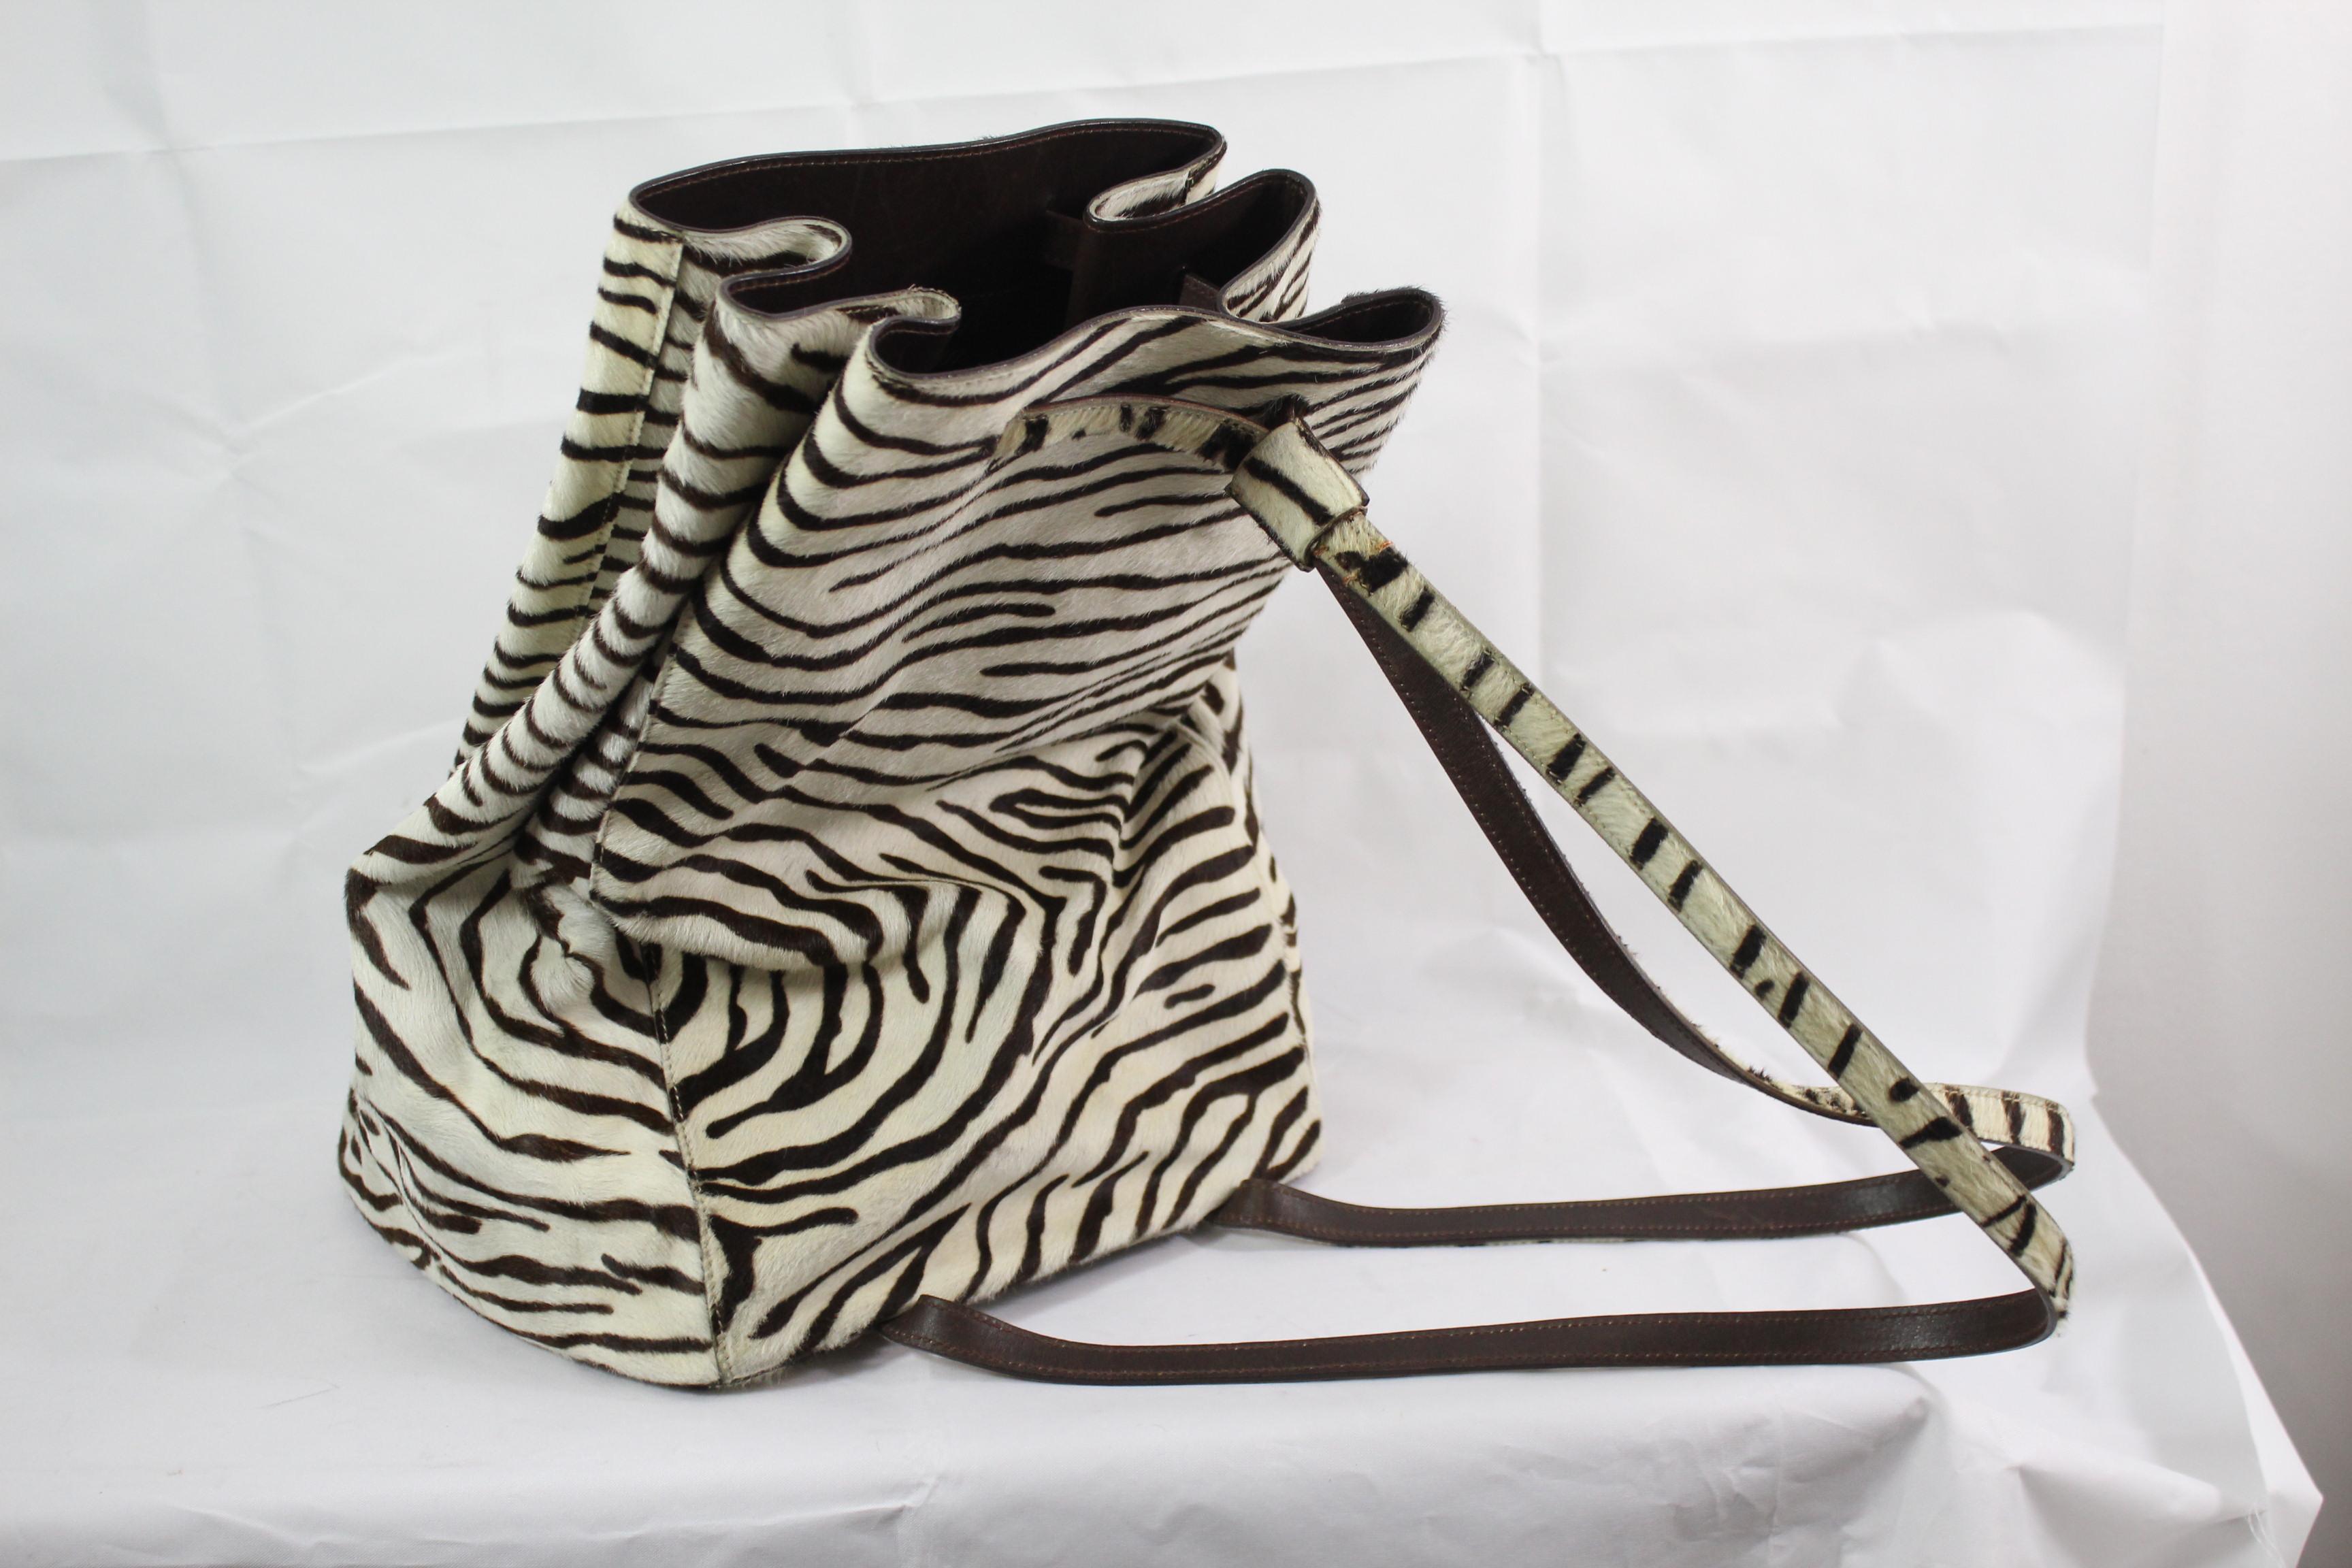 4d4c19b26757 amazon prada zebra print pony hair cavallino bag bianco bruci 35284 9d48d  9fe66; top quality beige prada zebra style leather backpack for sale 7cc5e  8c64c